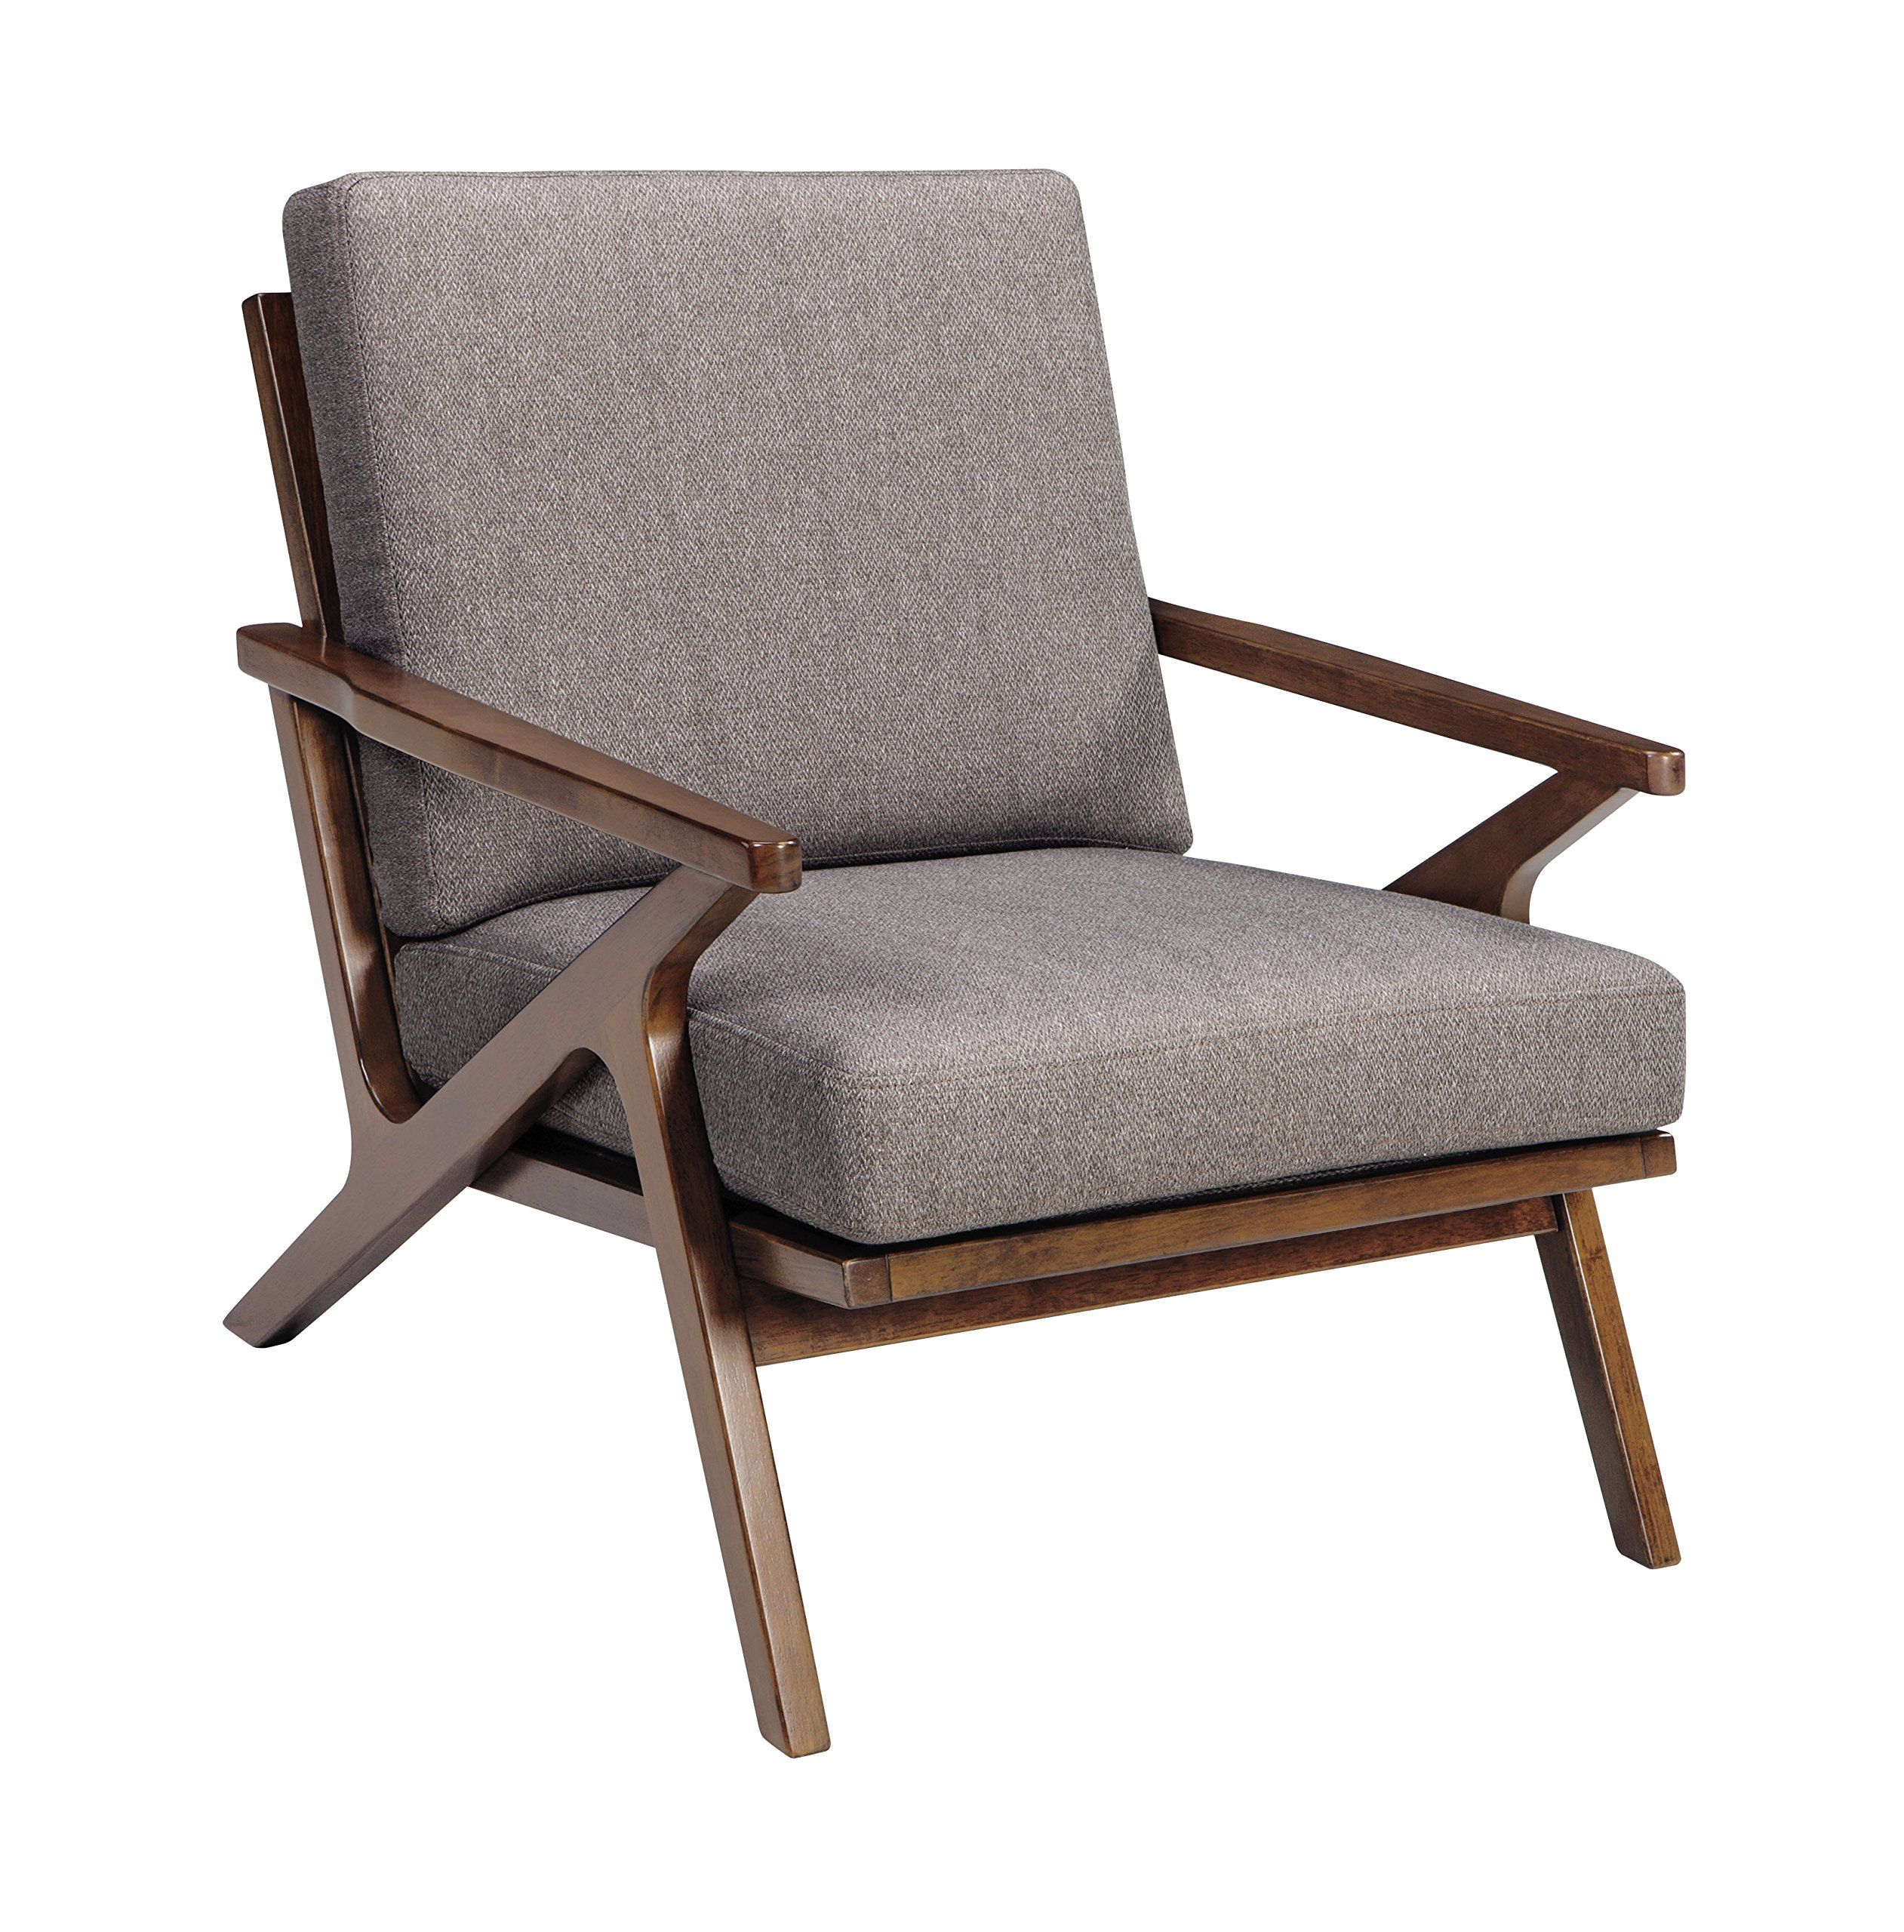 Ashley Furniture Signature Design Wavecove Accent Chair Mid